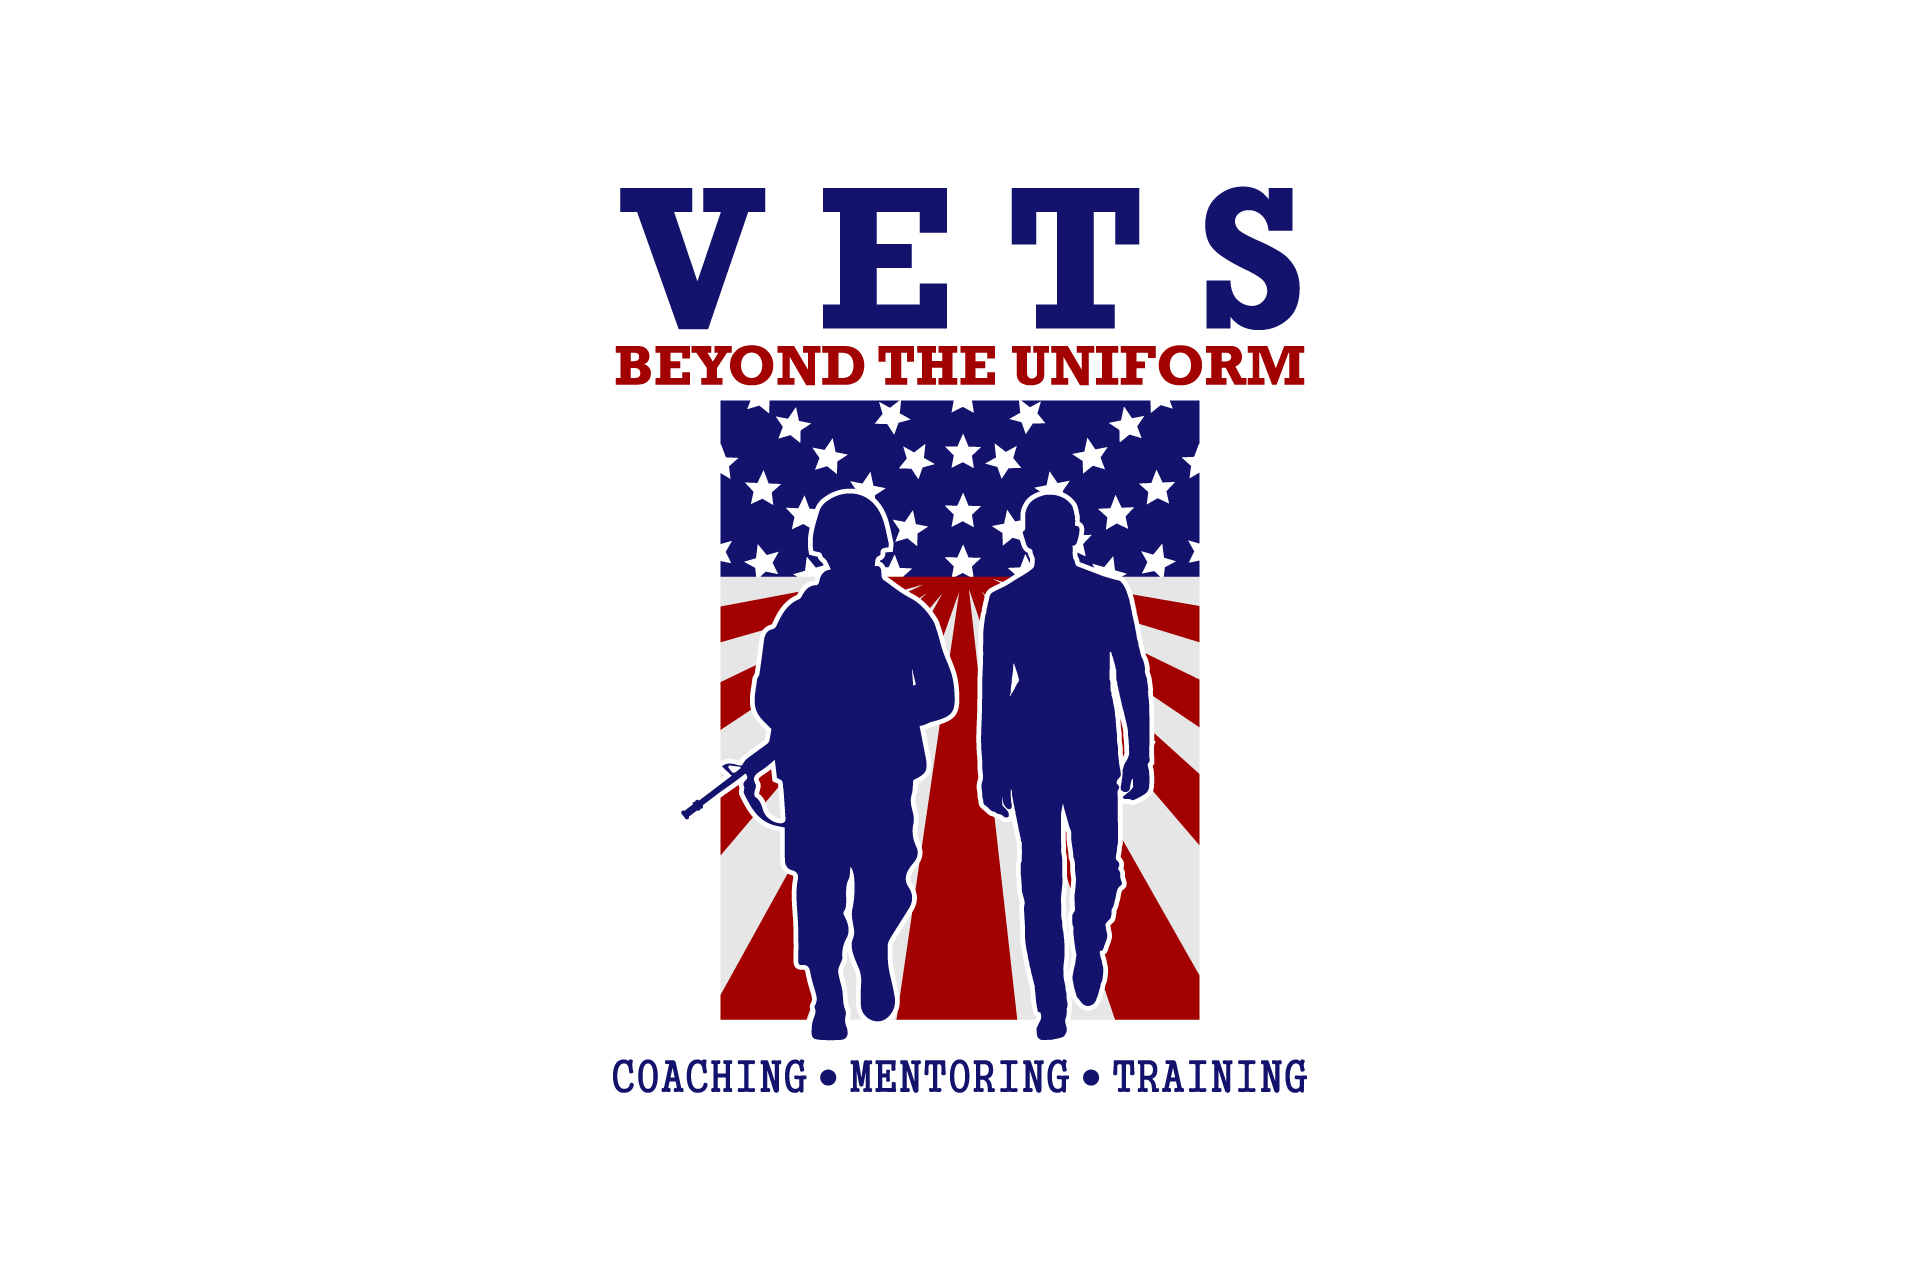 VETS Beyond the Uniform logo